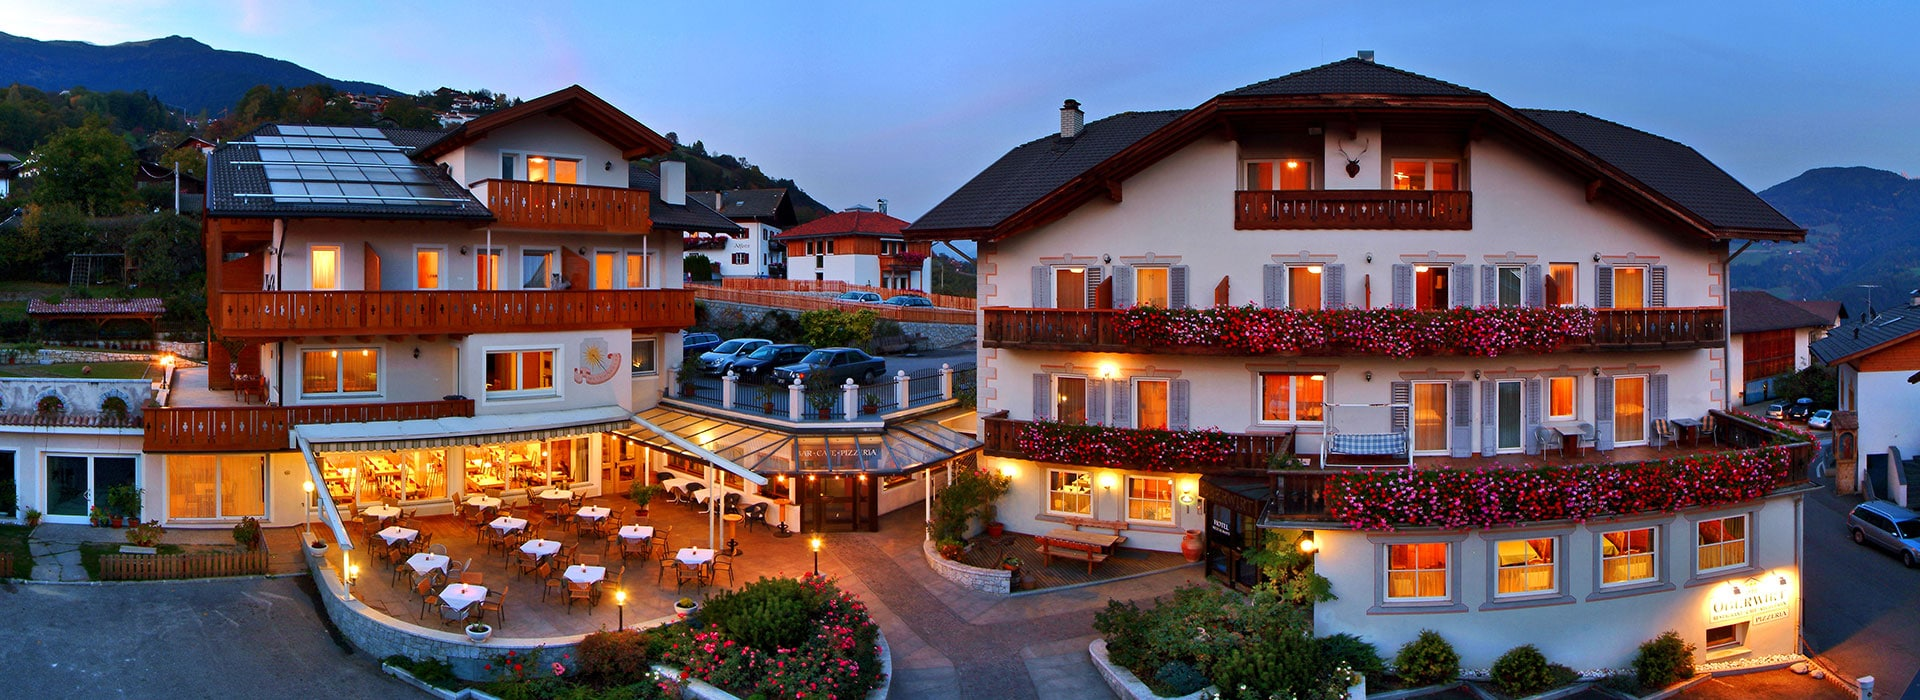 Hotel-Oberwirt-03